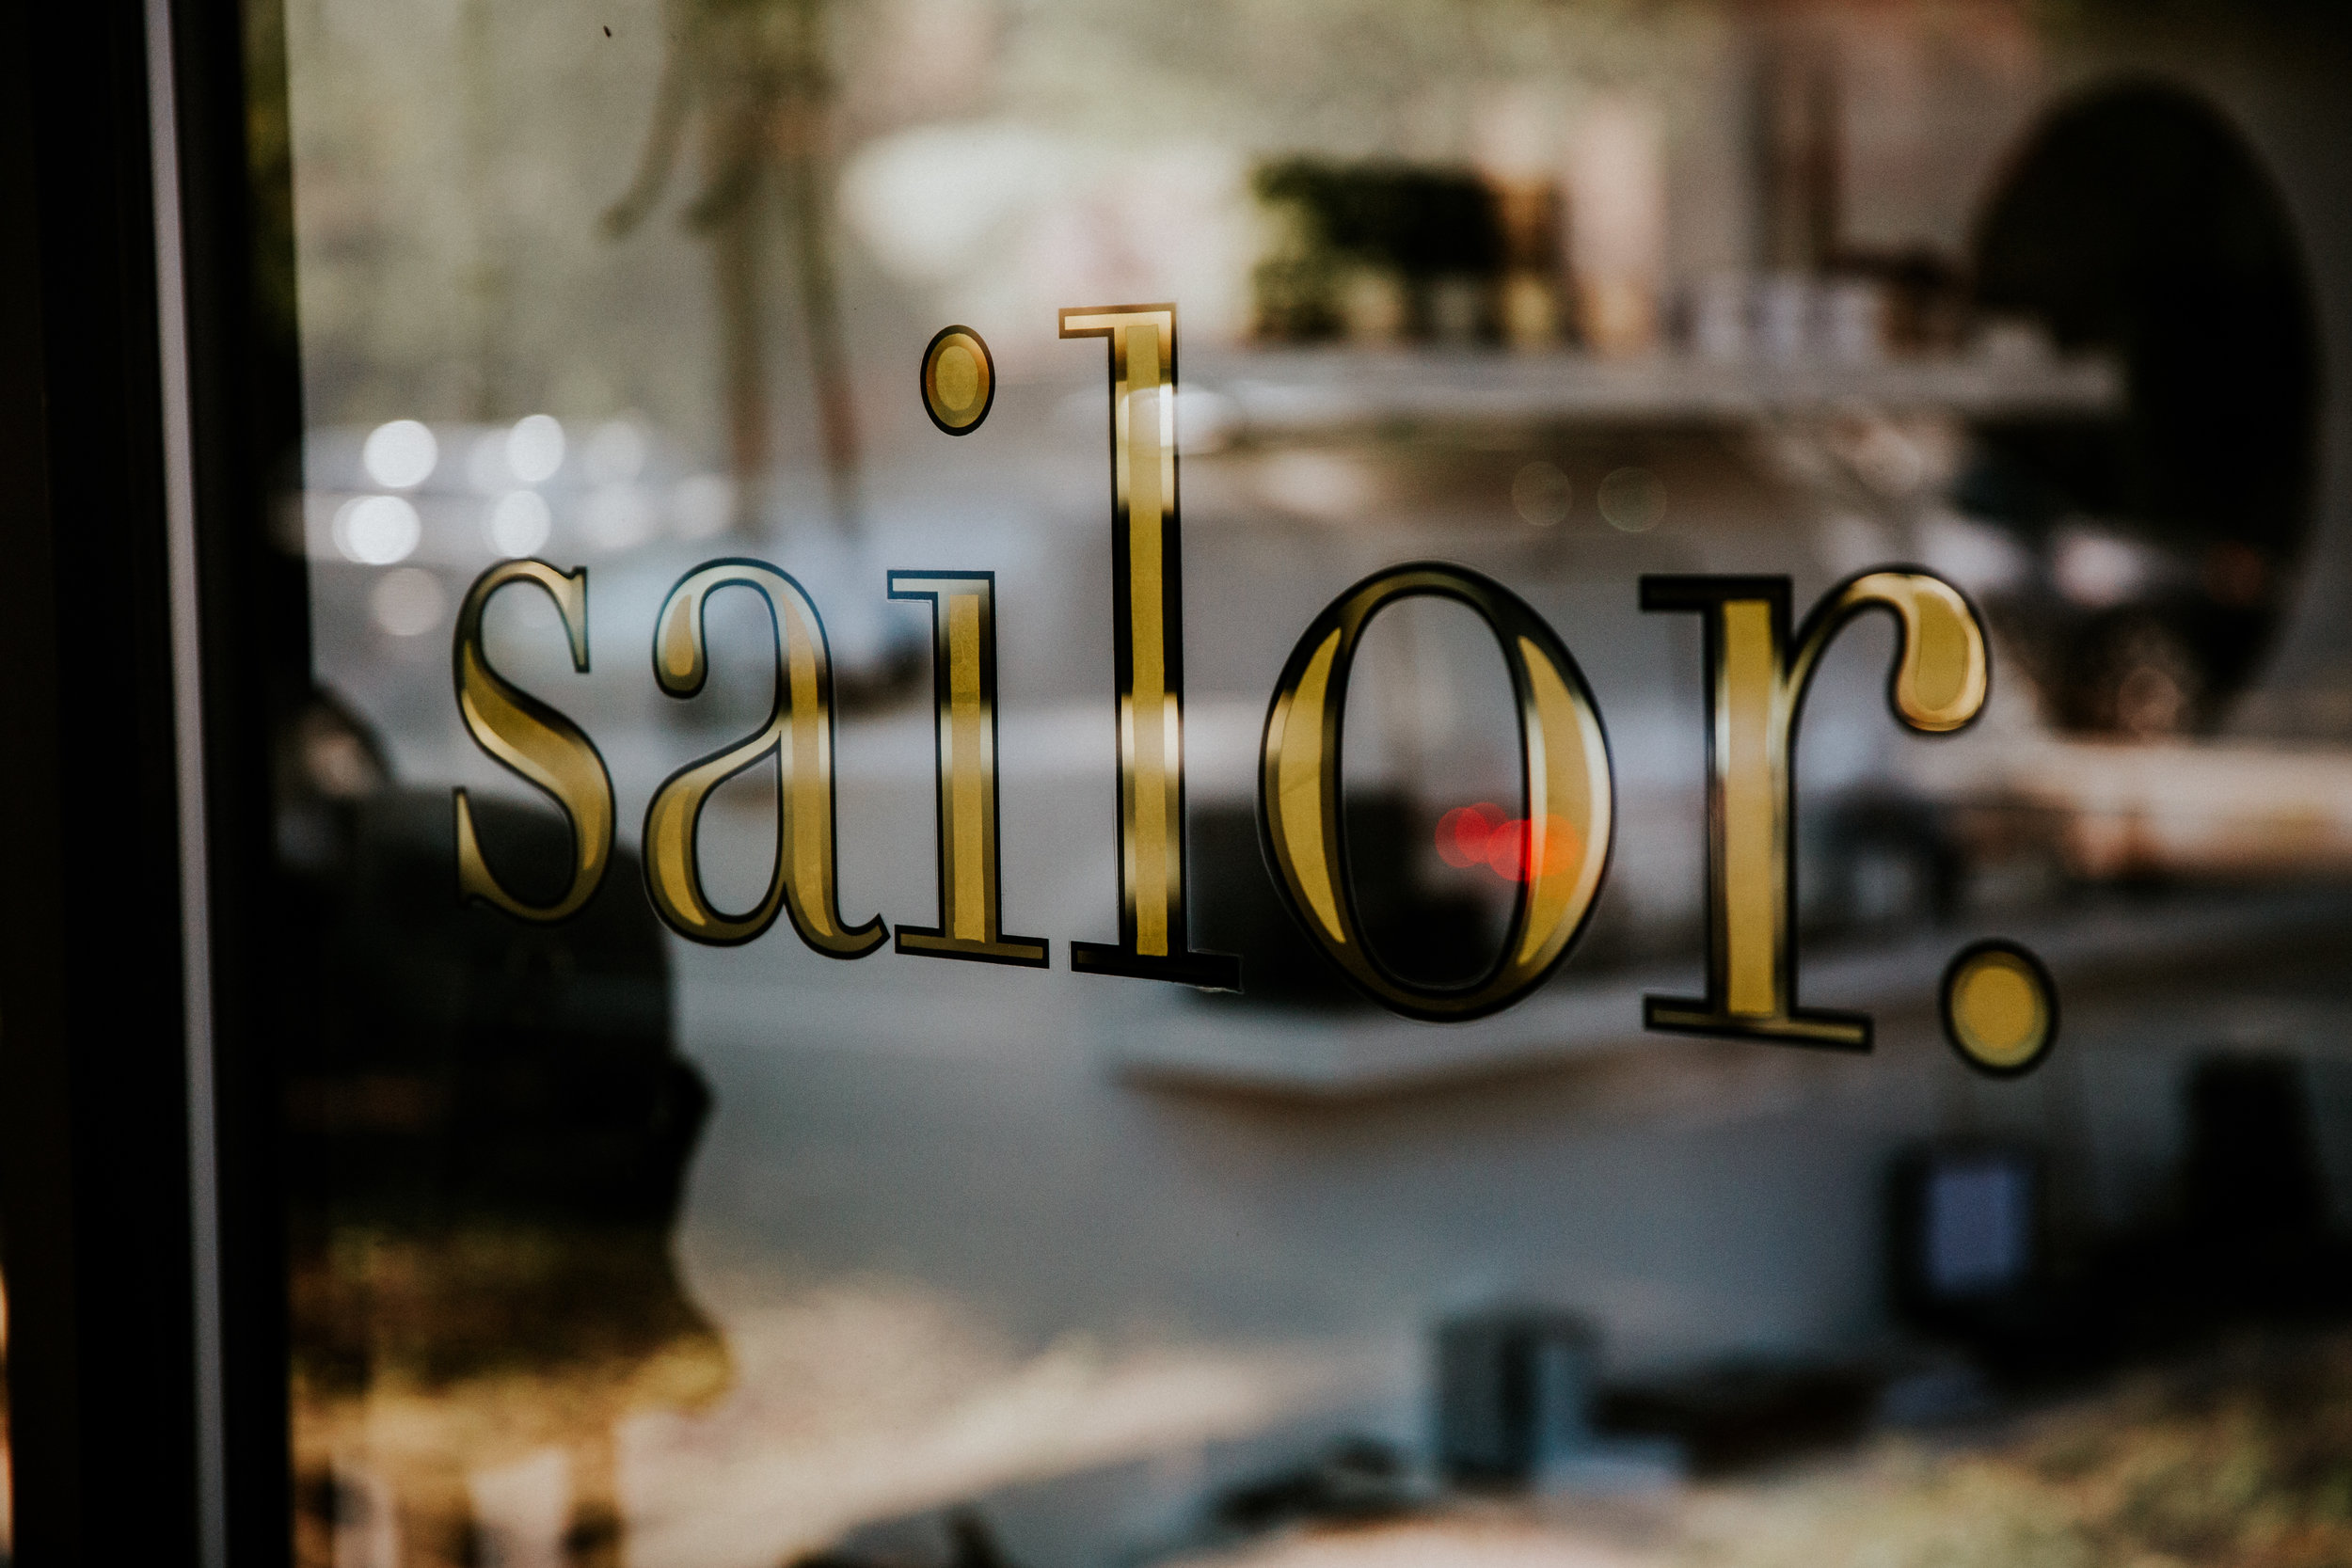 Sailor Shop_093.jpg